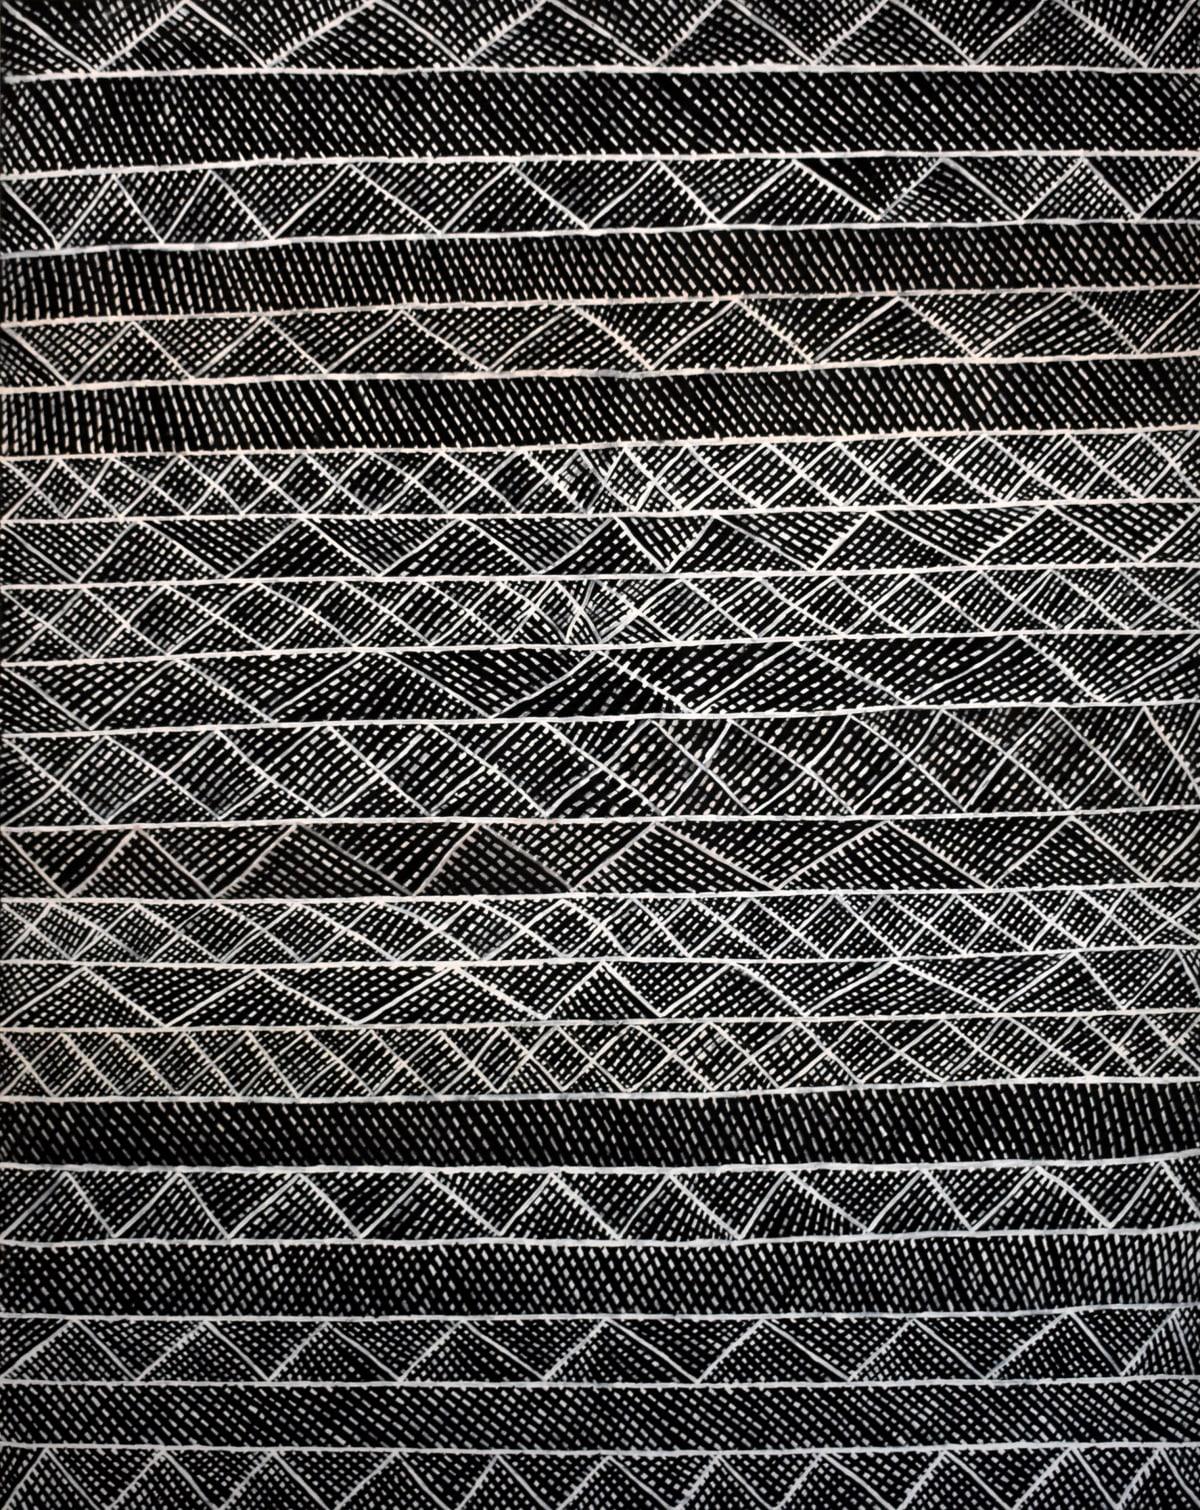 Jacinta Lorenzo Jilamara natural ochres on linen 120 x 150 cm